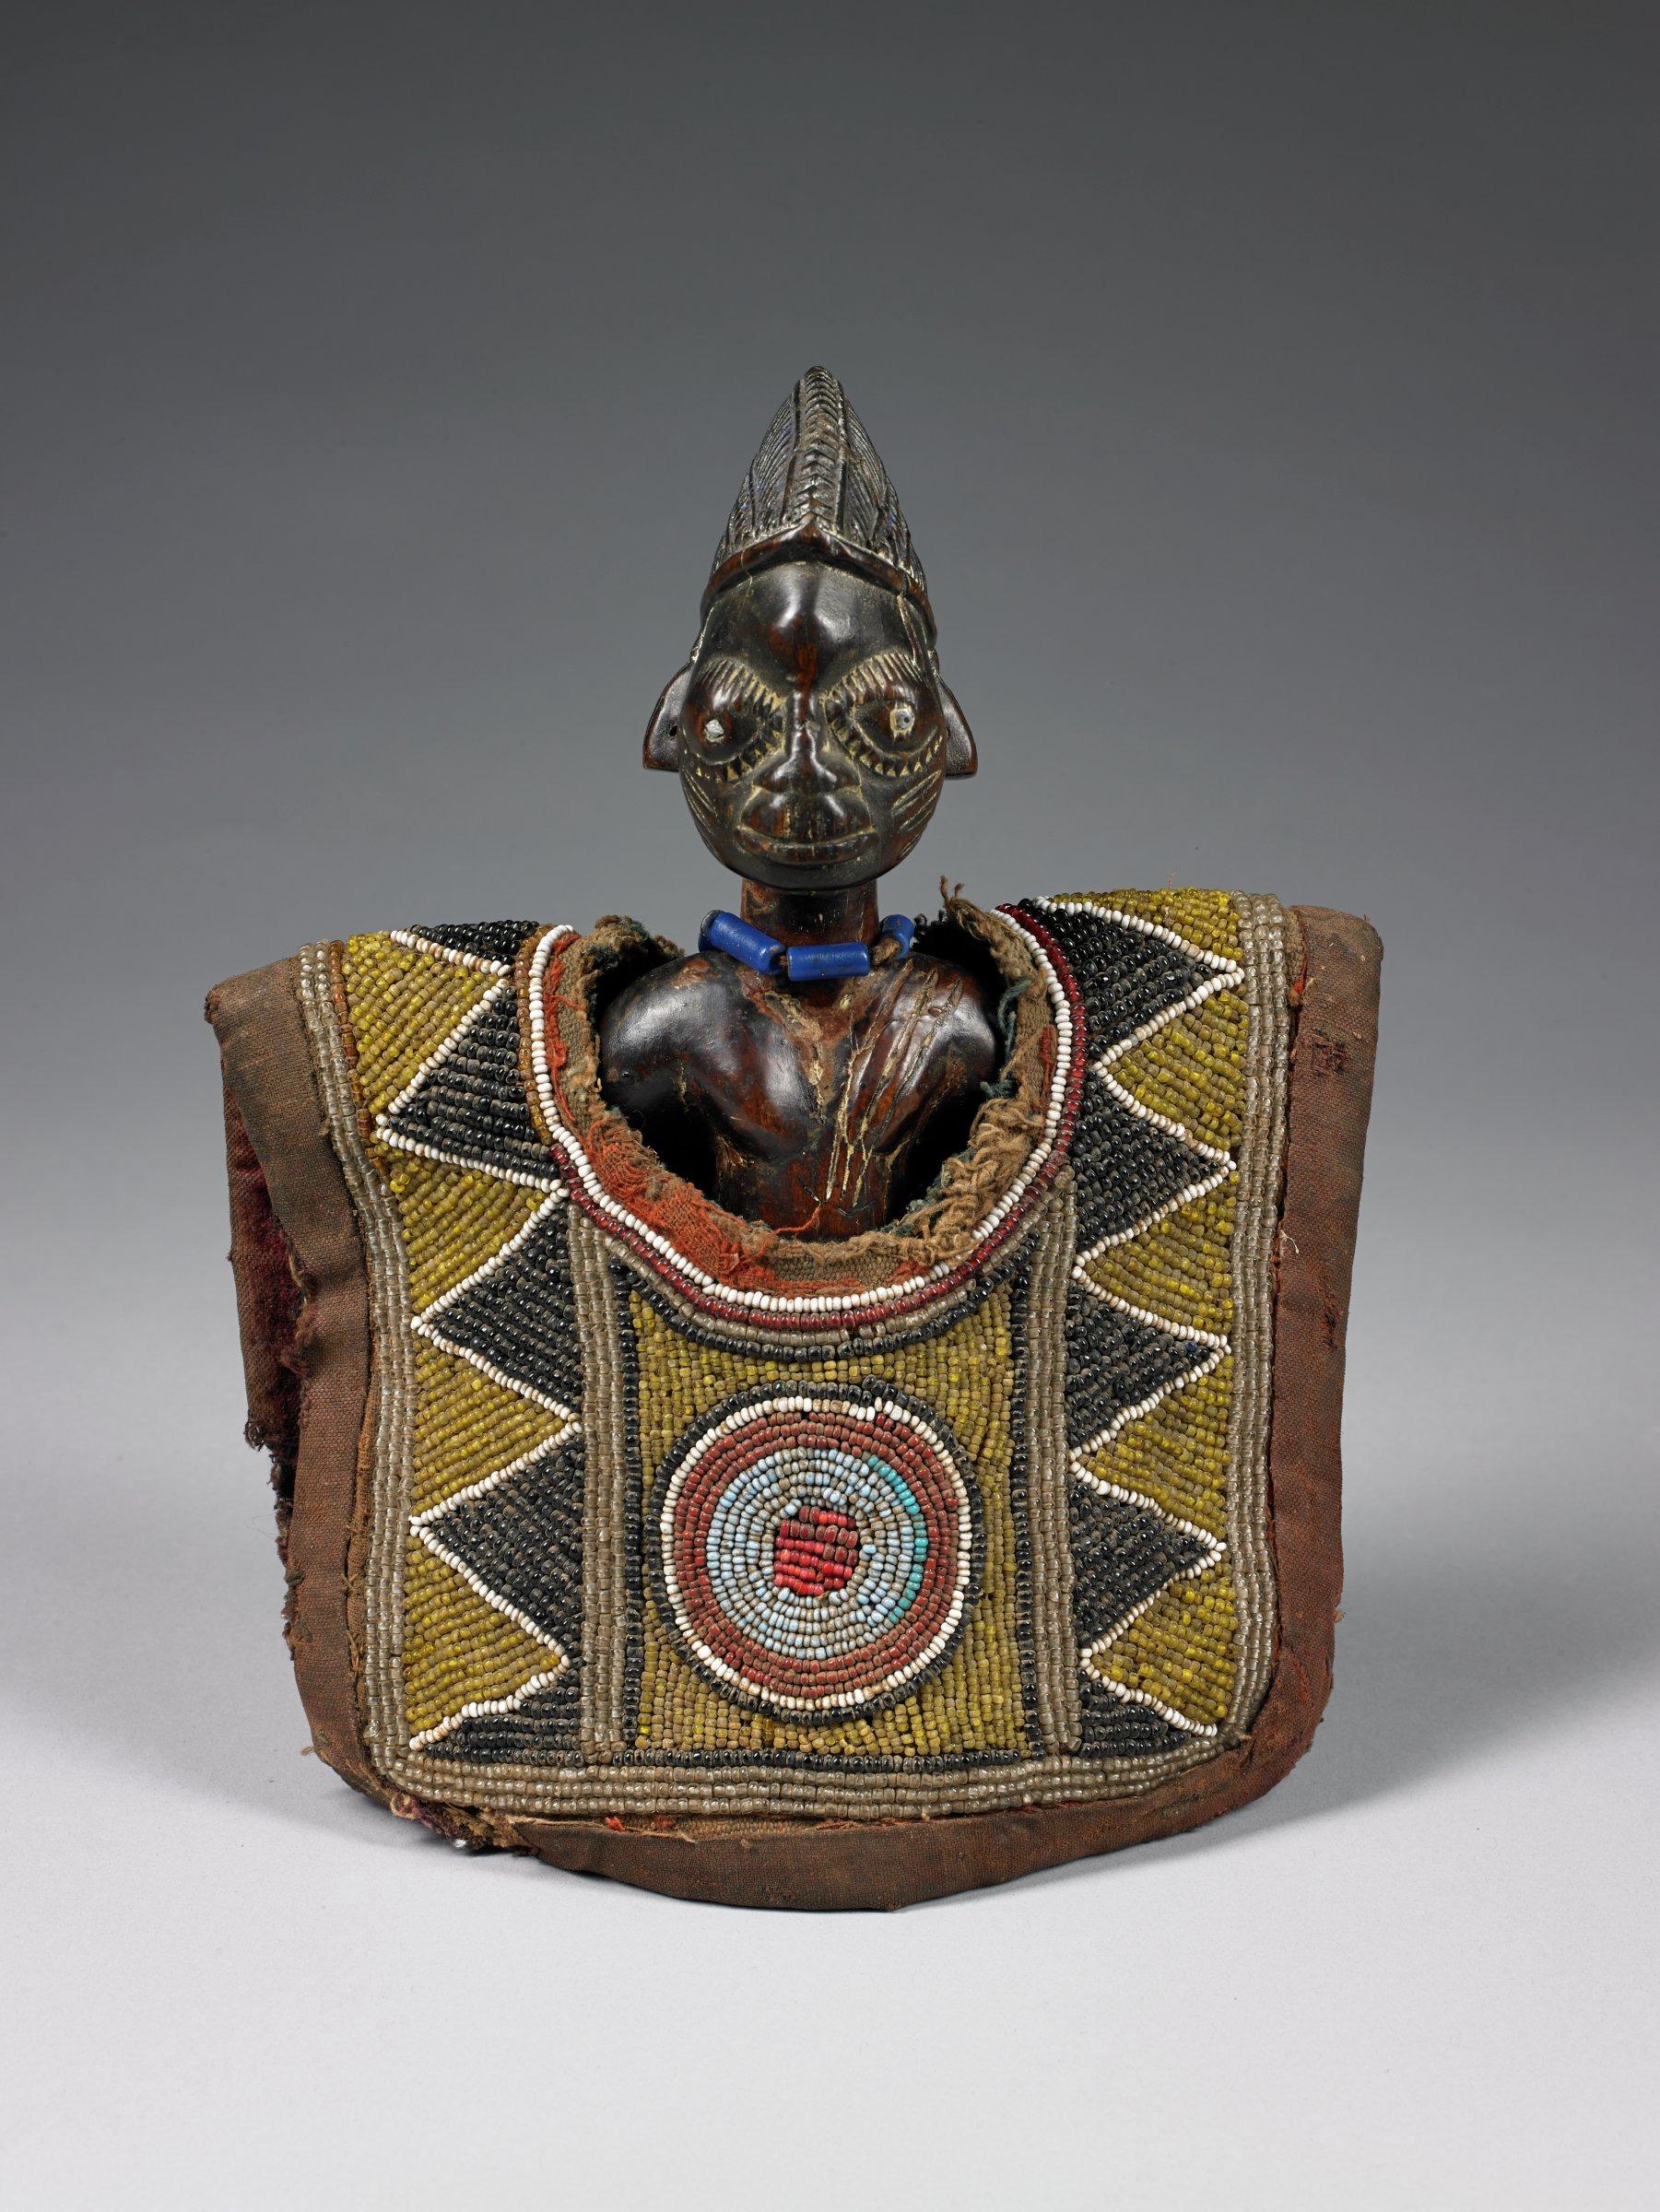 Twin Figure (ere ibeji) 20th century, Yoruba people, Nigeria, wood, fabric, glass beads, thread, Anonymous gift, 1991.975.1-2